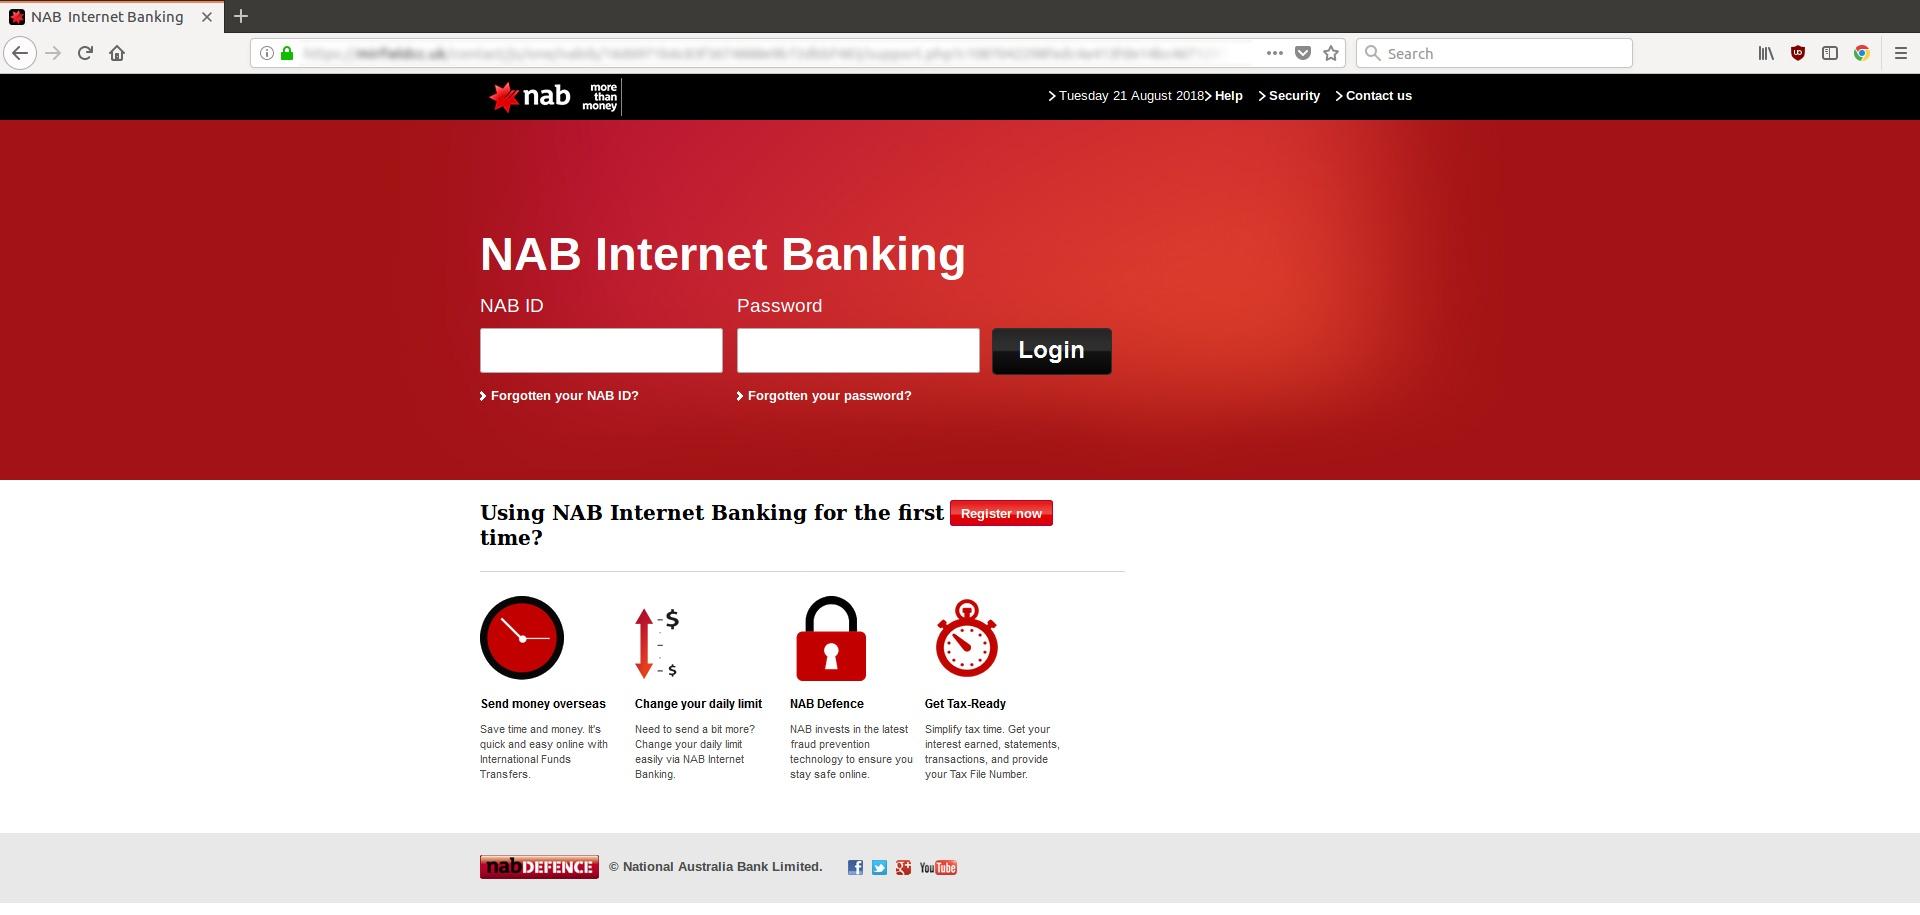 NAB Bank branding hijacked in new credit card fraud